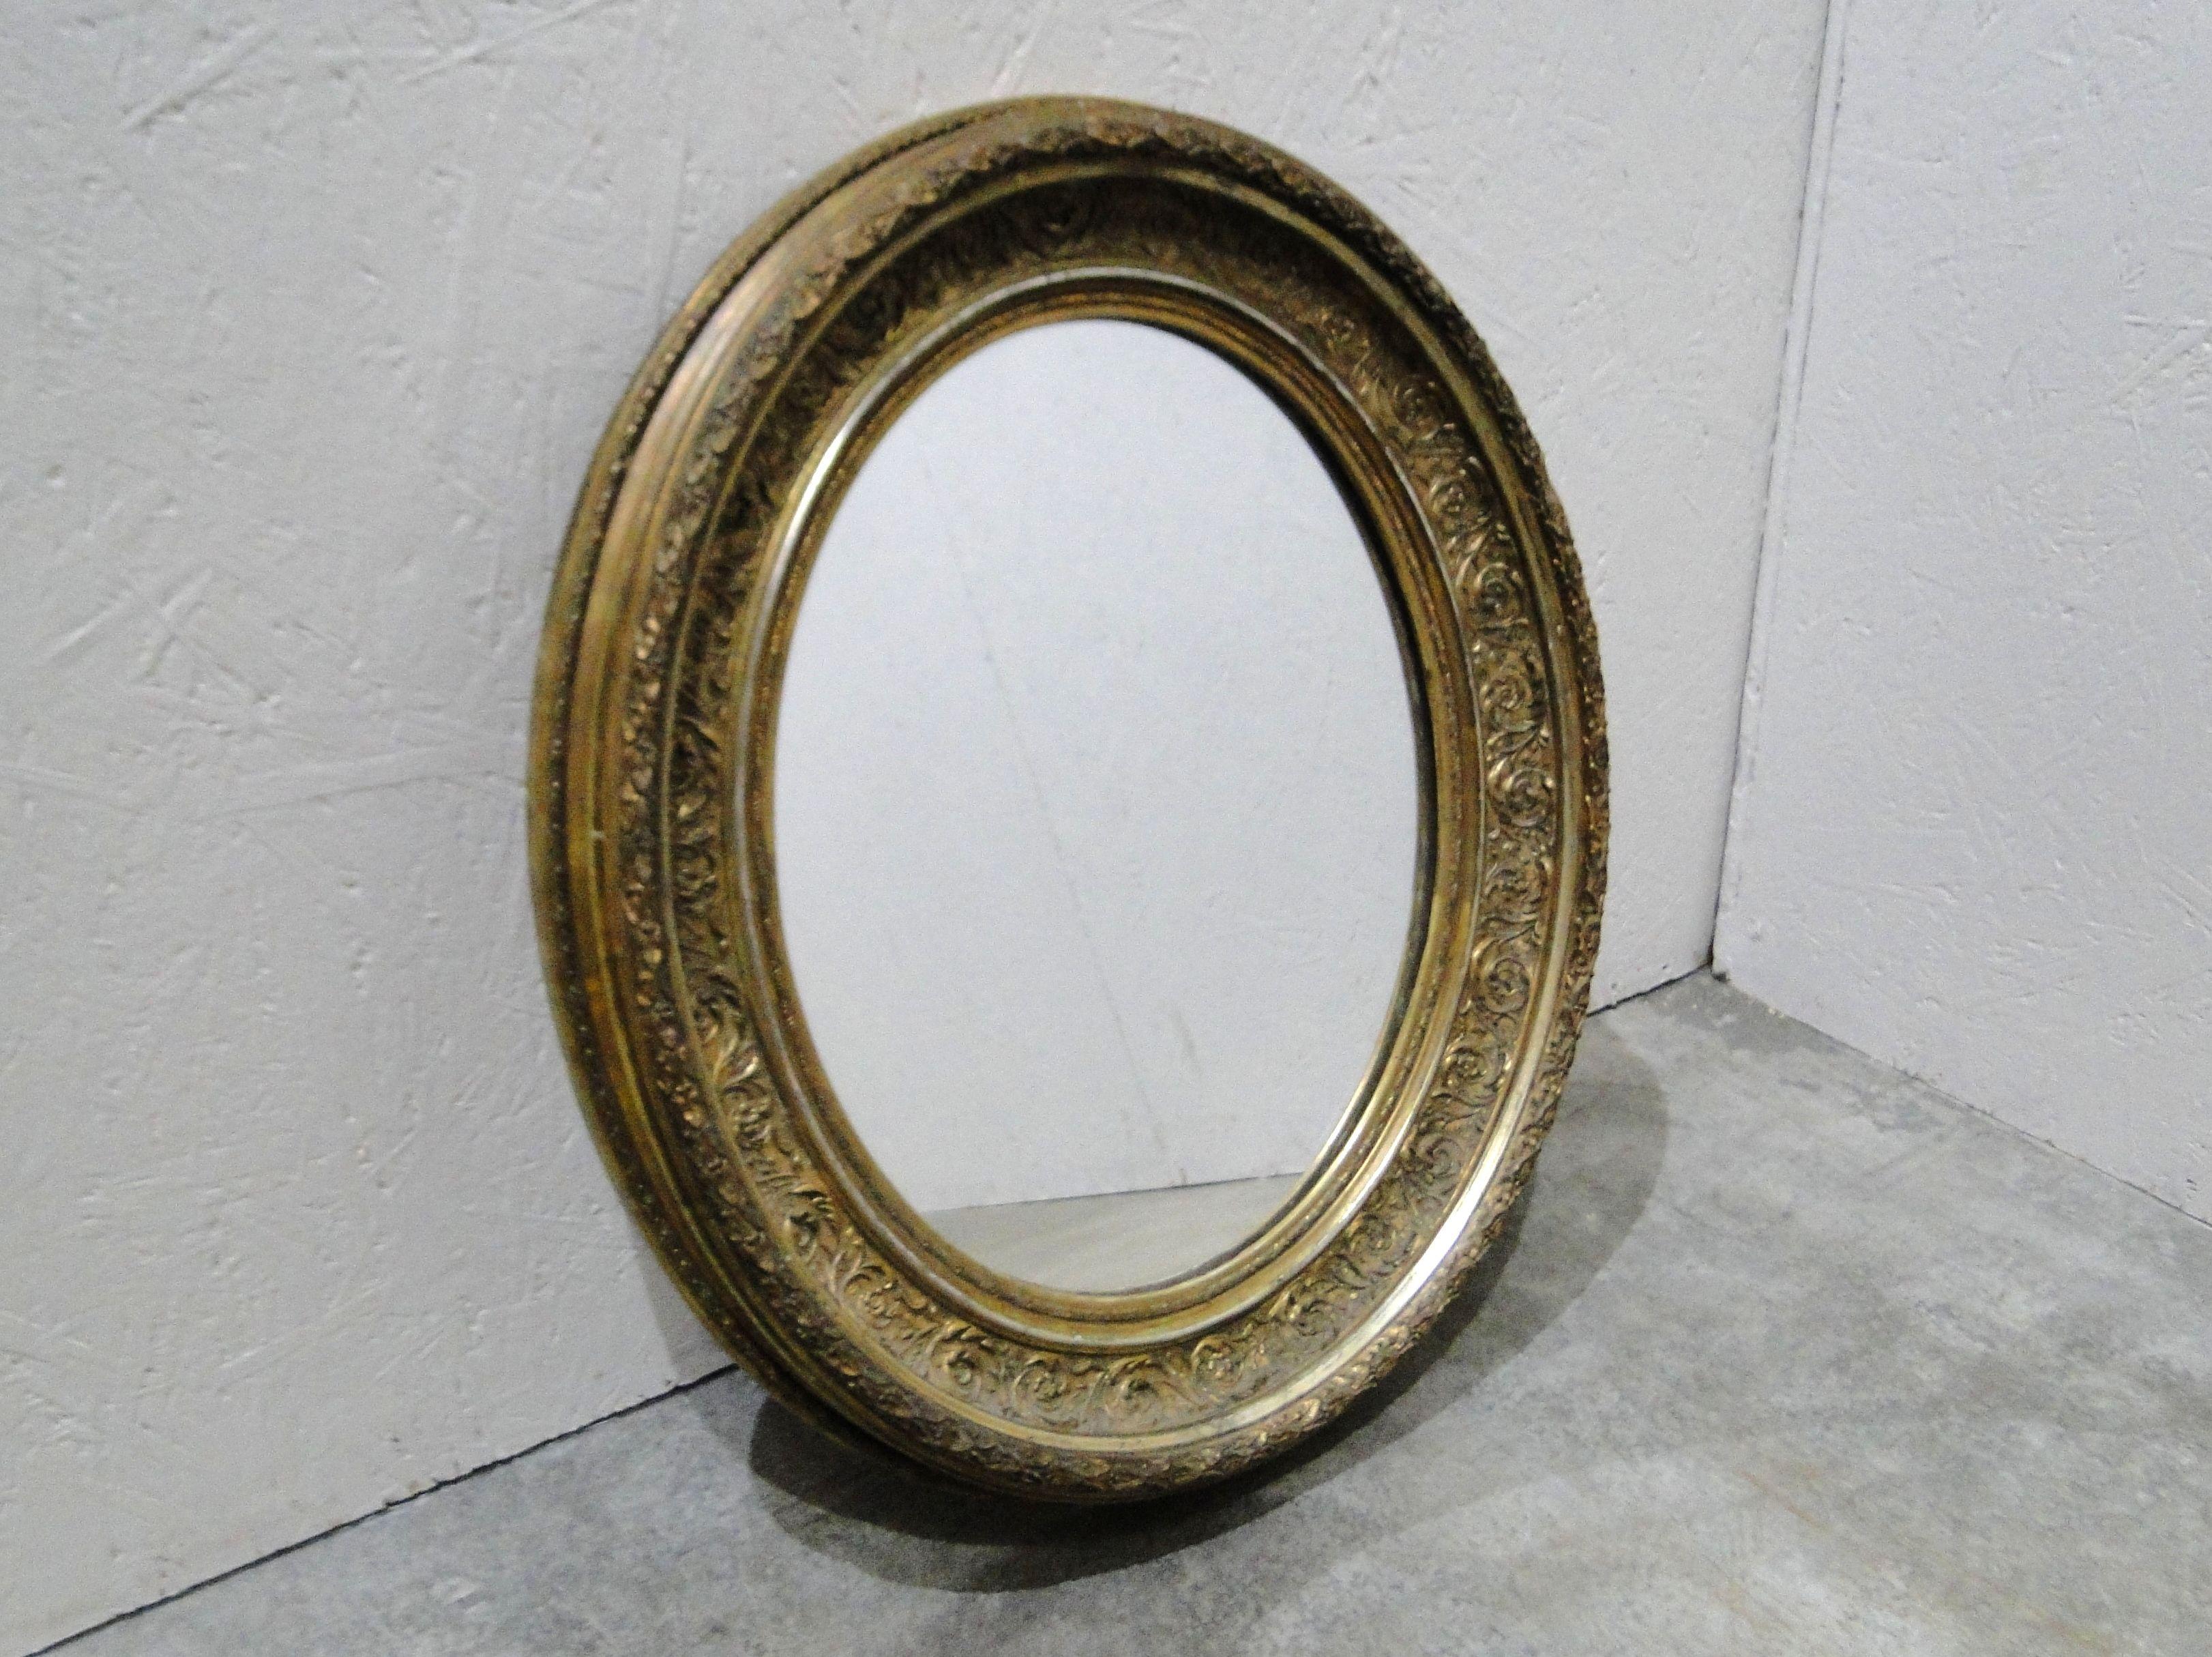 61) A Good Vintage Gilt Framed Round Wall Mirror